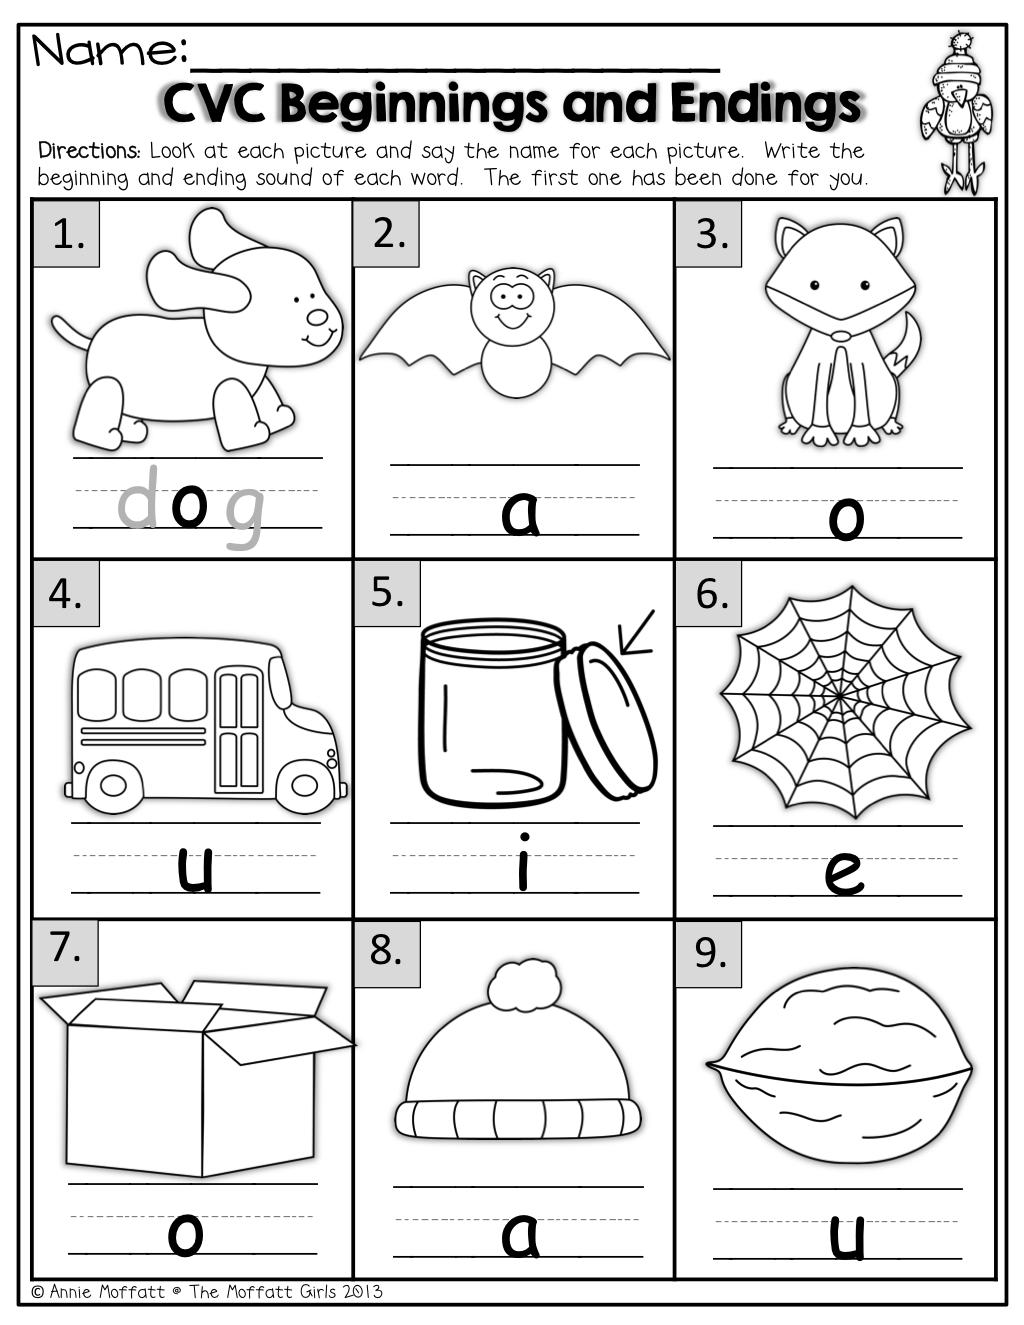 Beginning Sounds Worksheets Kindergarten   Criabooks